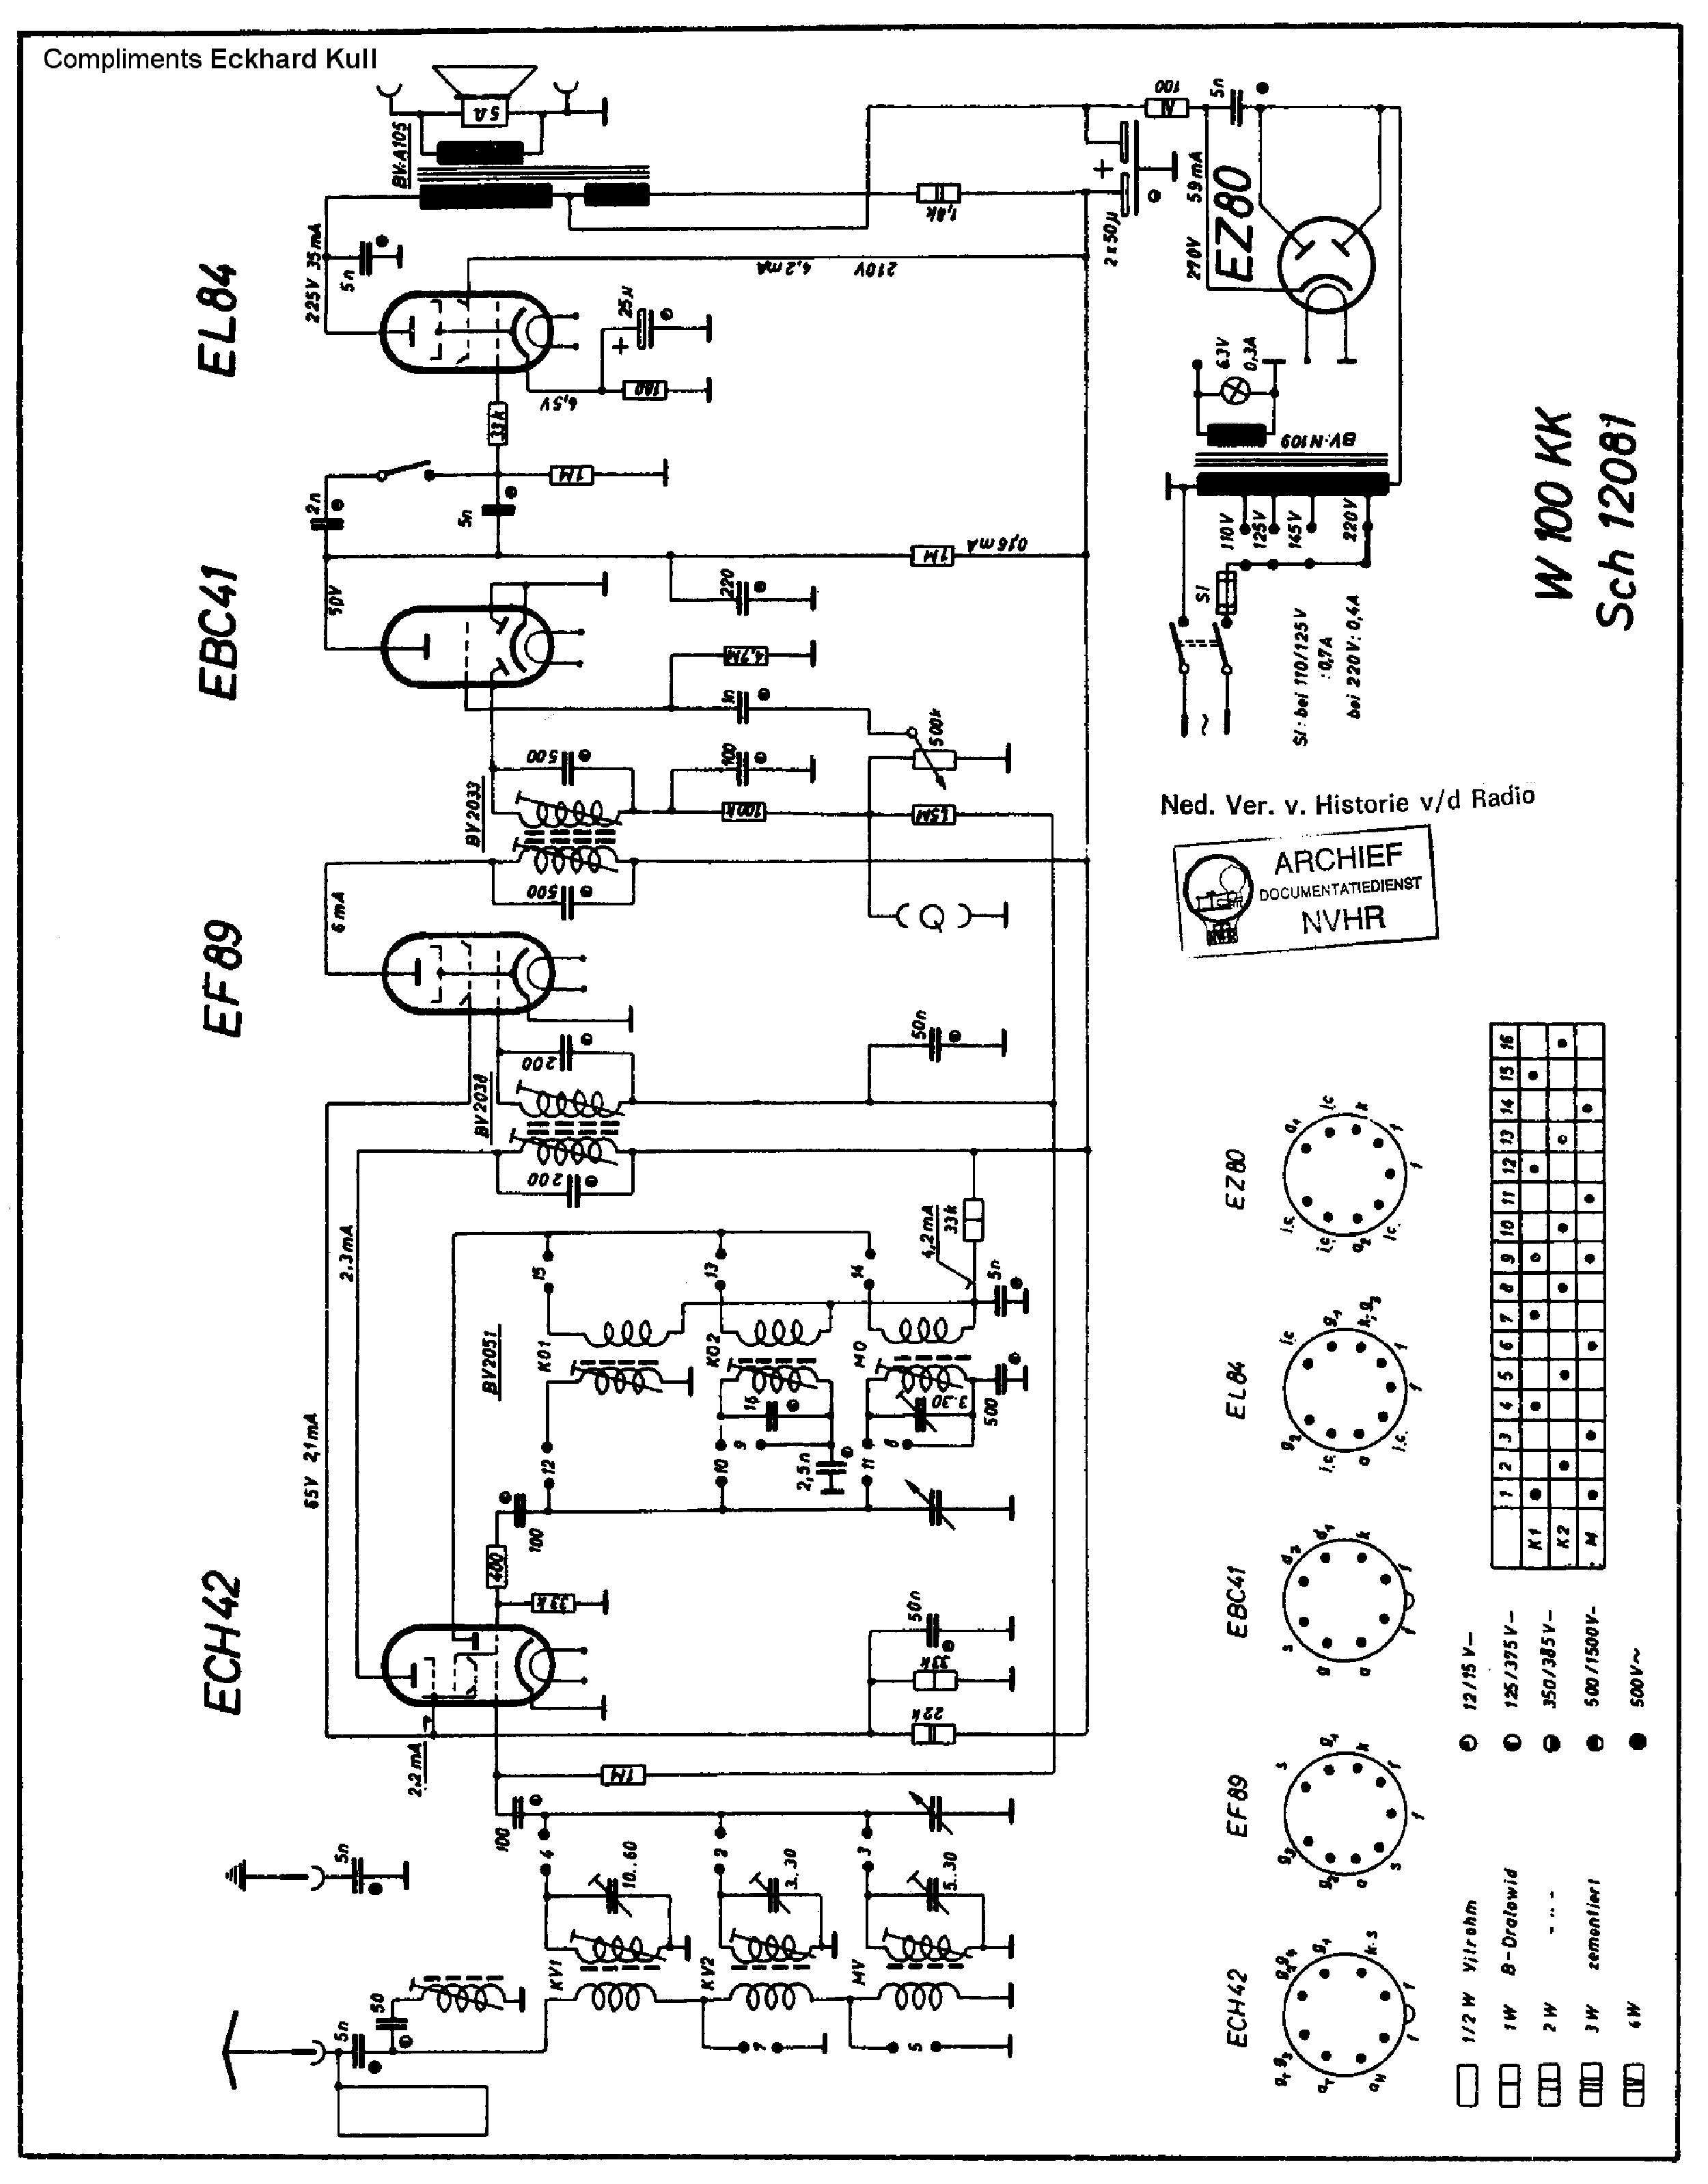 tonfunk w100kk ac receiver sch service manual download schematics Distribution Transformer Schematic tonfunk w100kk ac receiver sch service manual 1st page